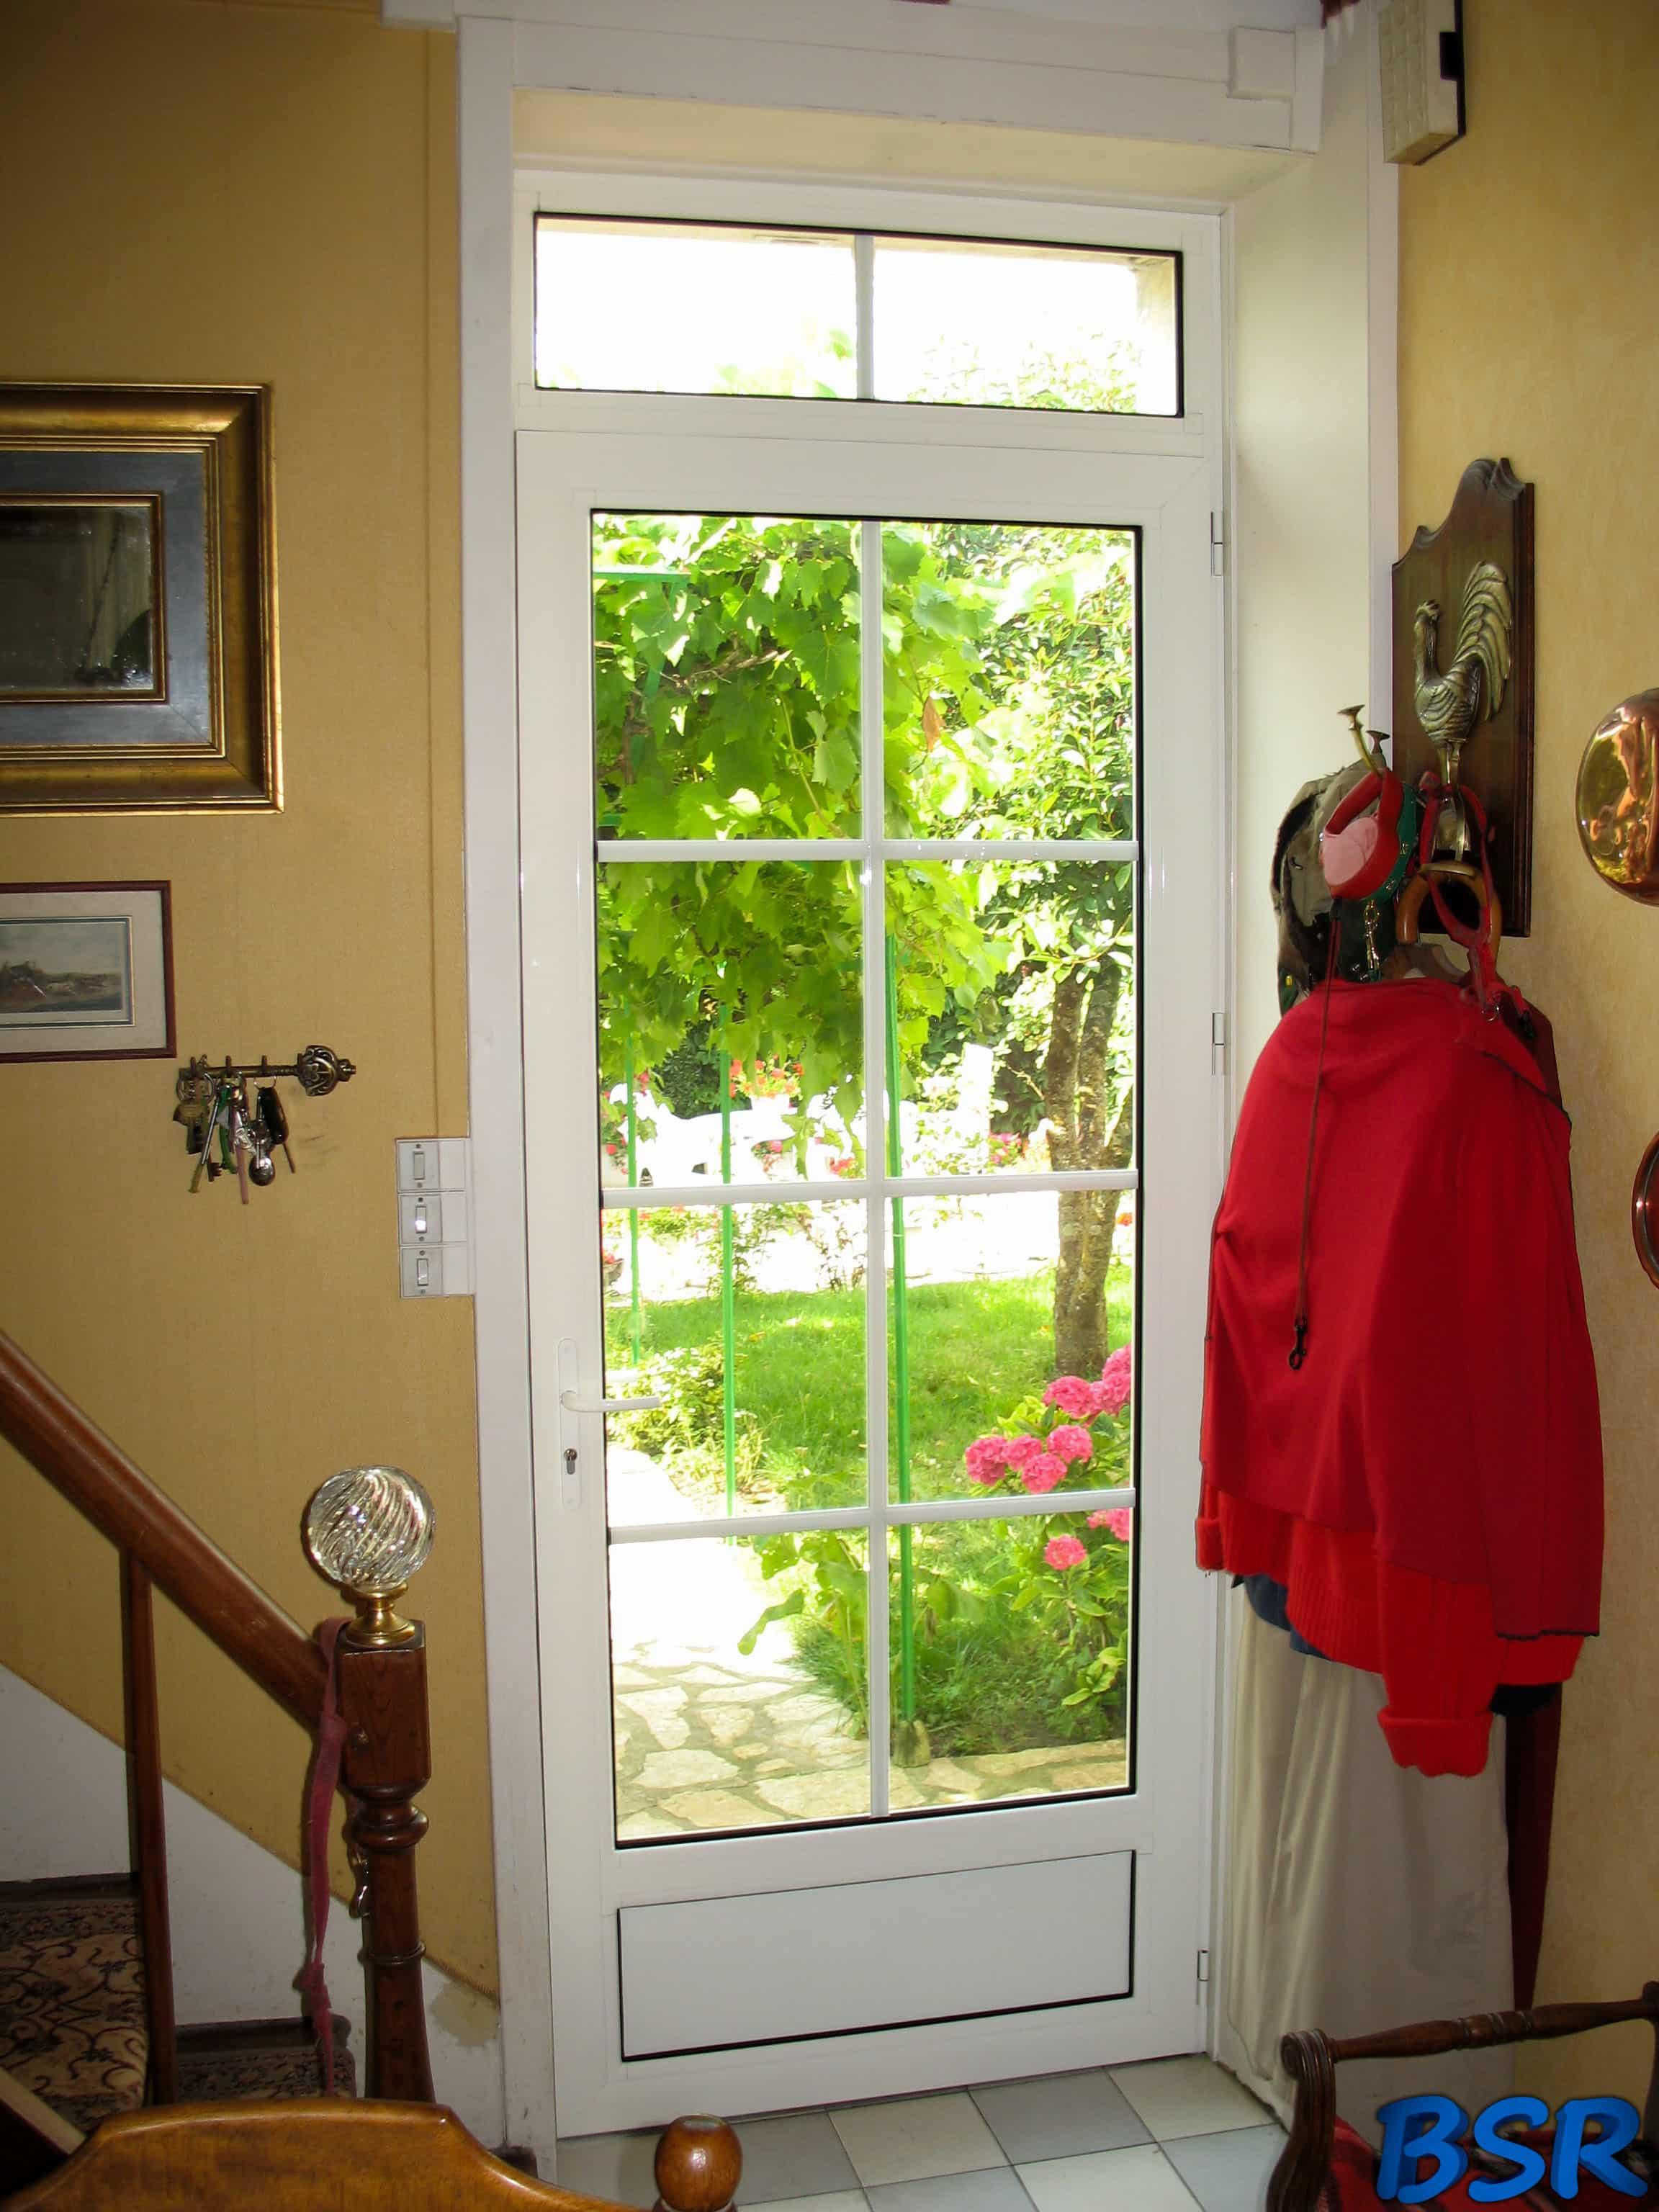 Porte et fenêtre Aluminium BSR 009